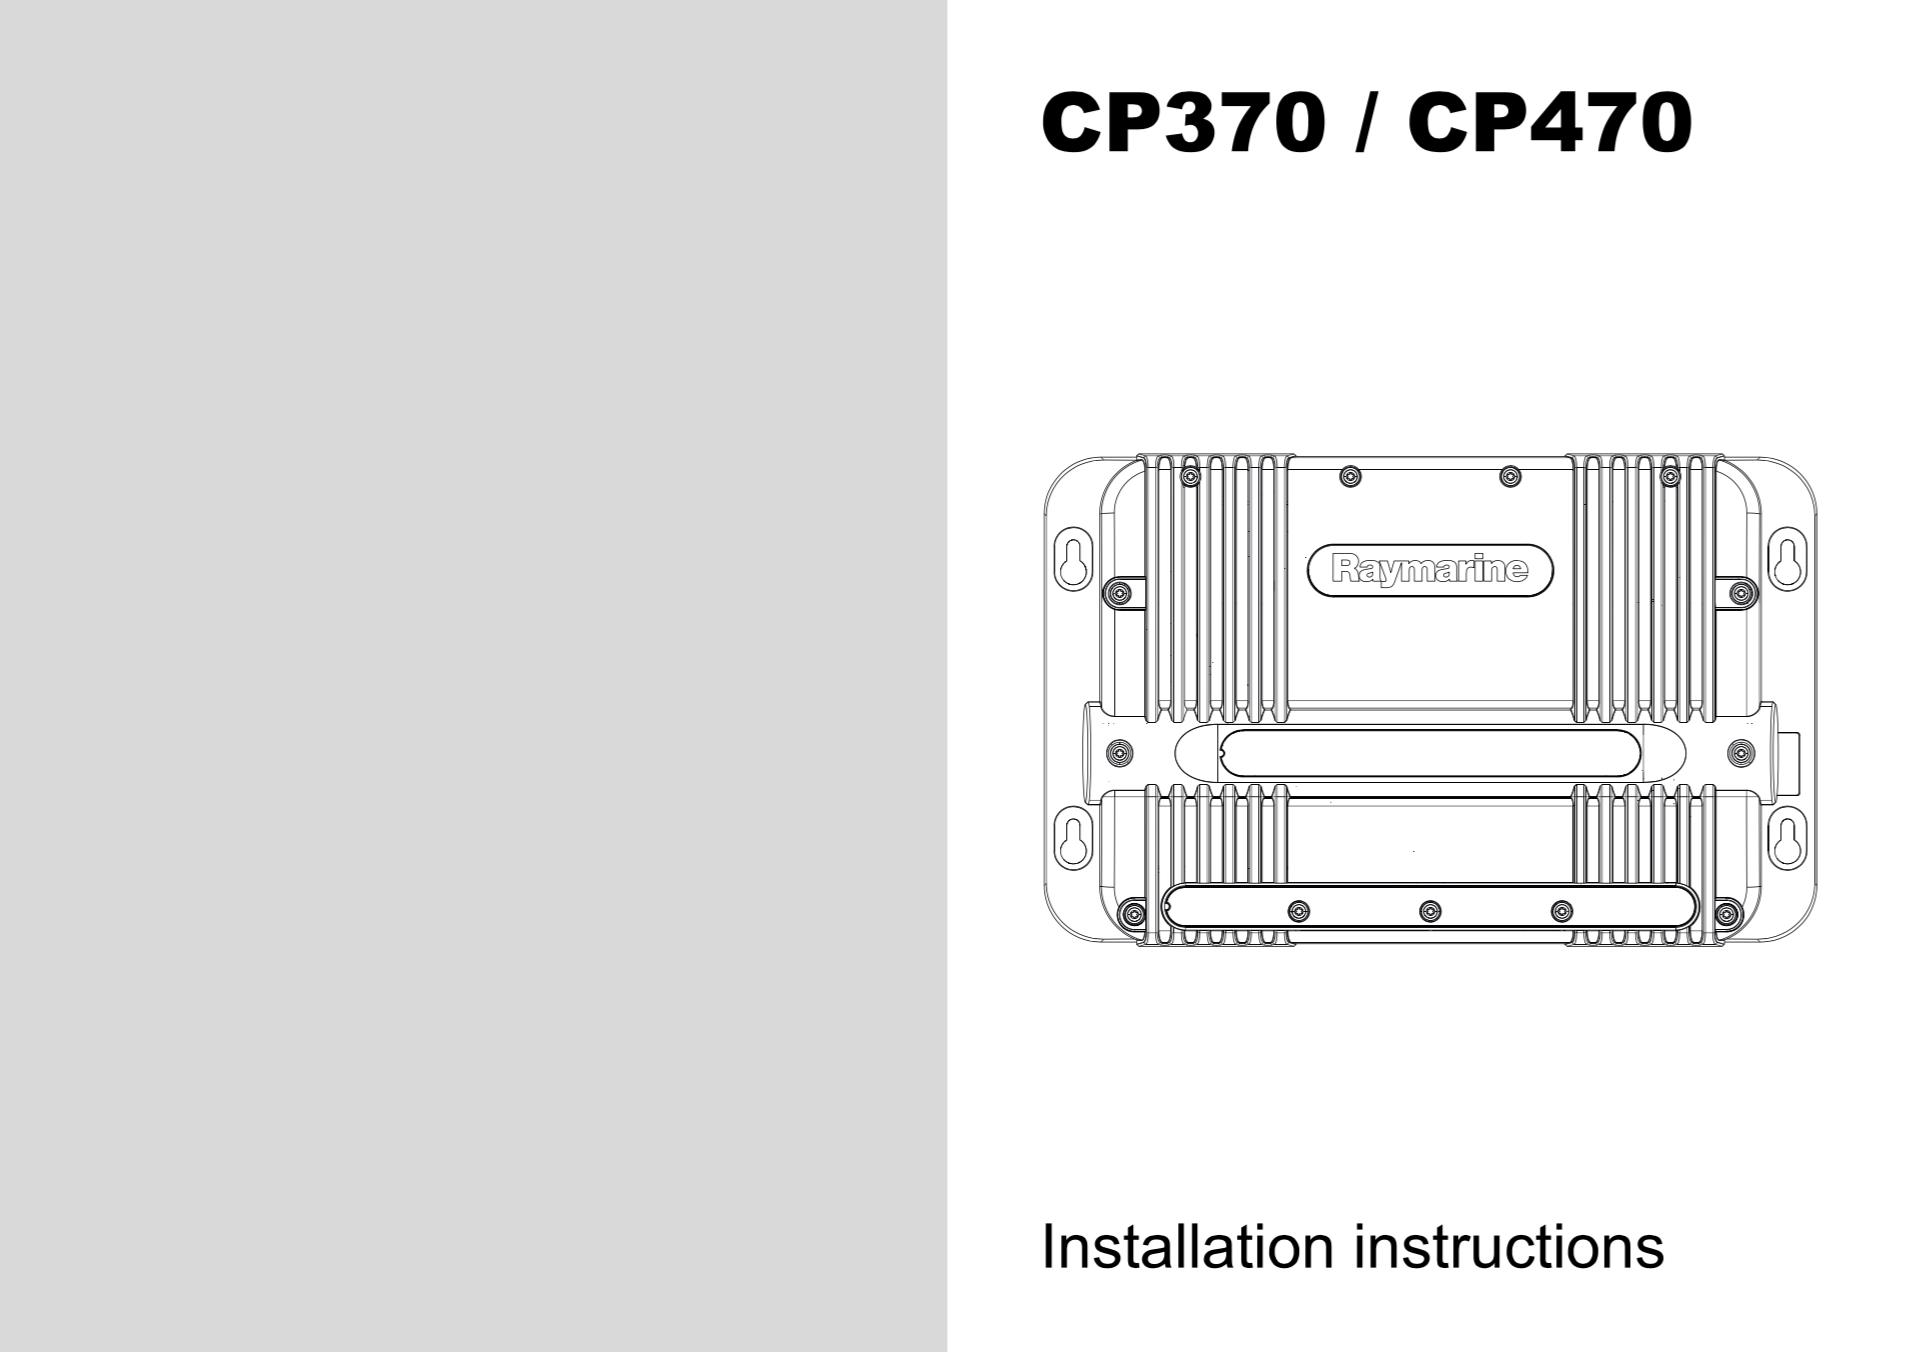 hight resolution of raynet rj45 wiring diagram